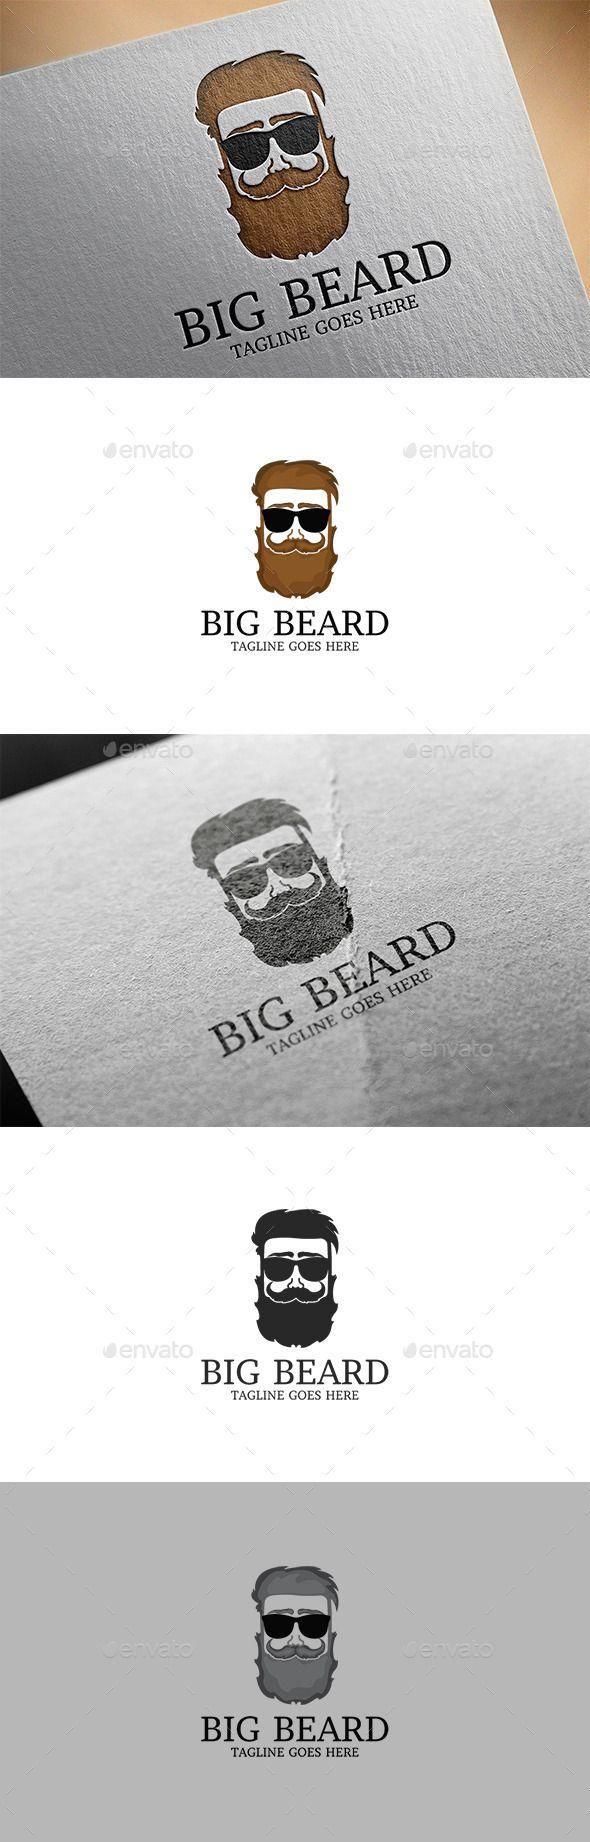 Beard Logo Design Template Vector #logotype Download it here: http://graphicriver.net/item/beard-logo/11933175?s_rank=1470?ref=nexion